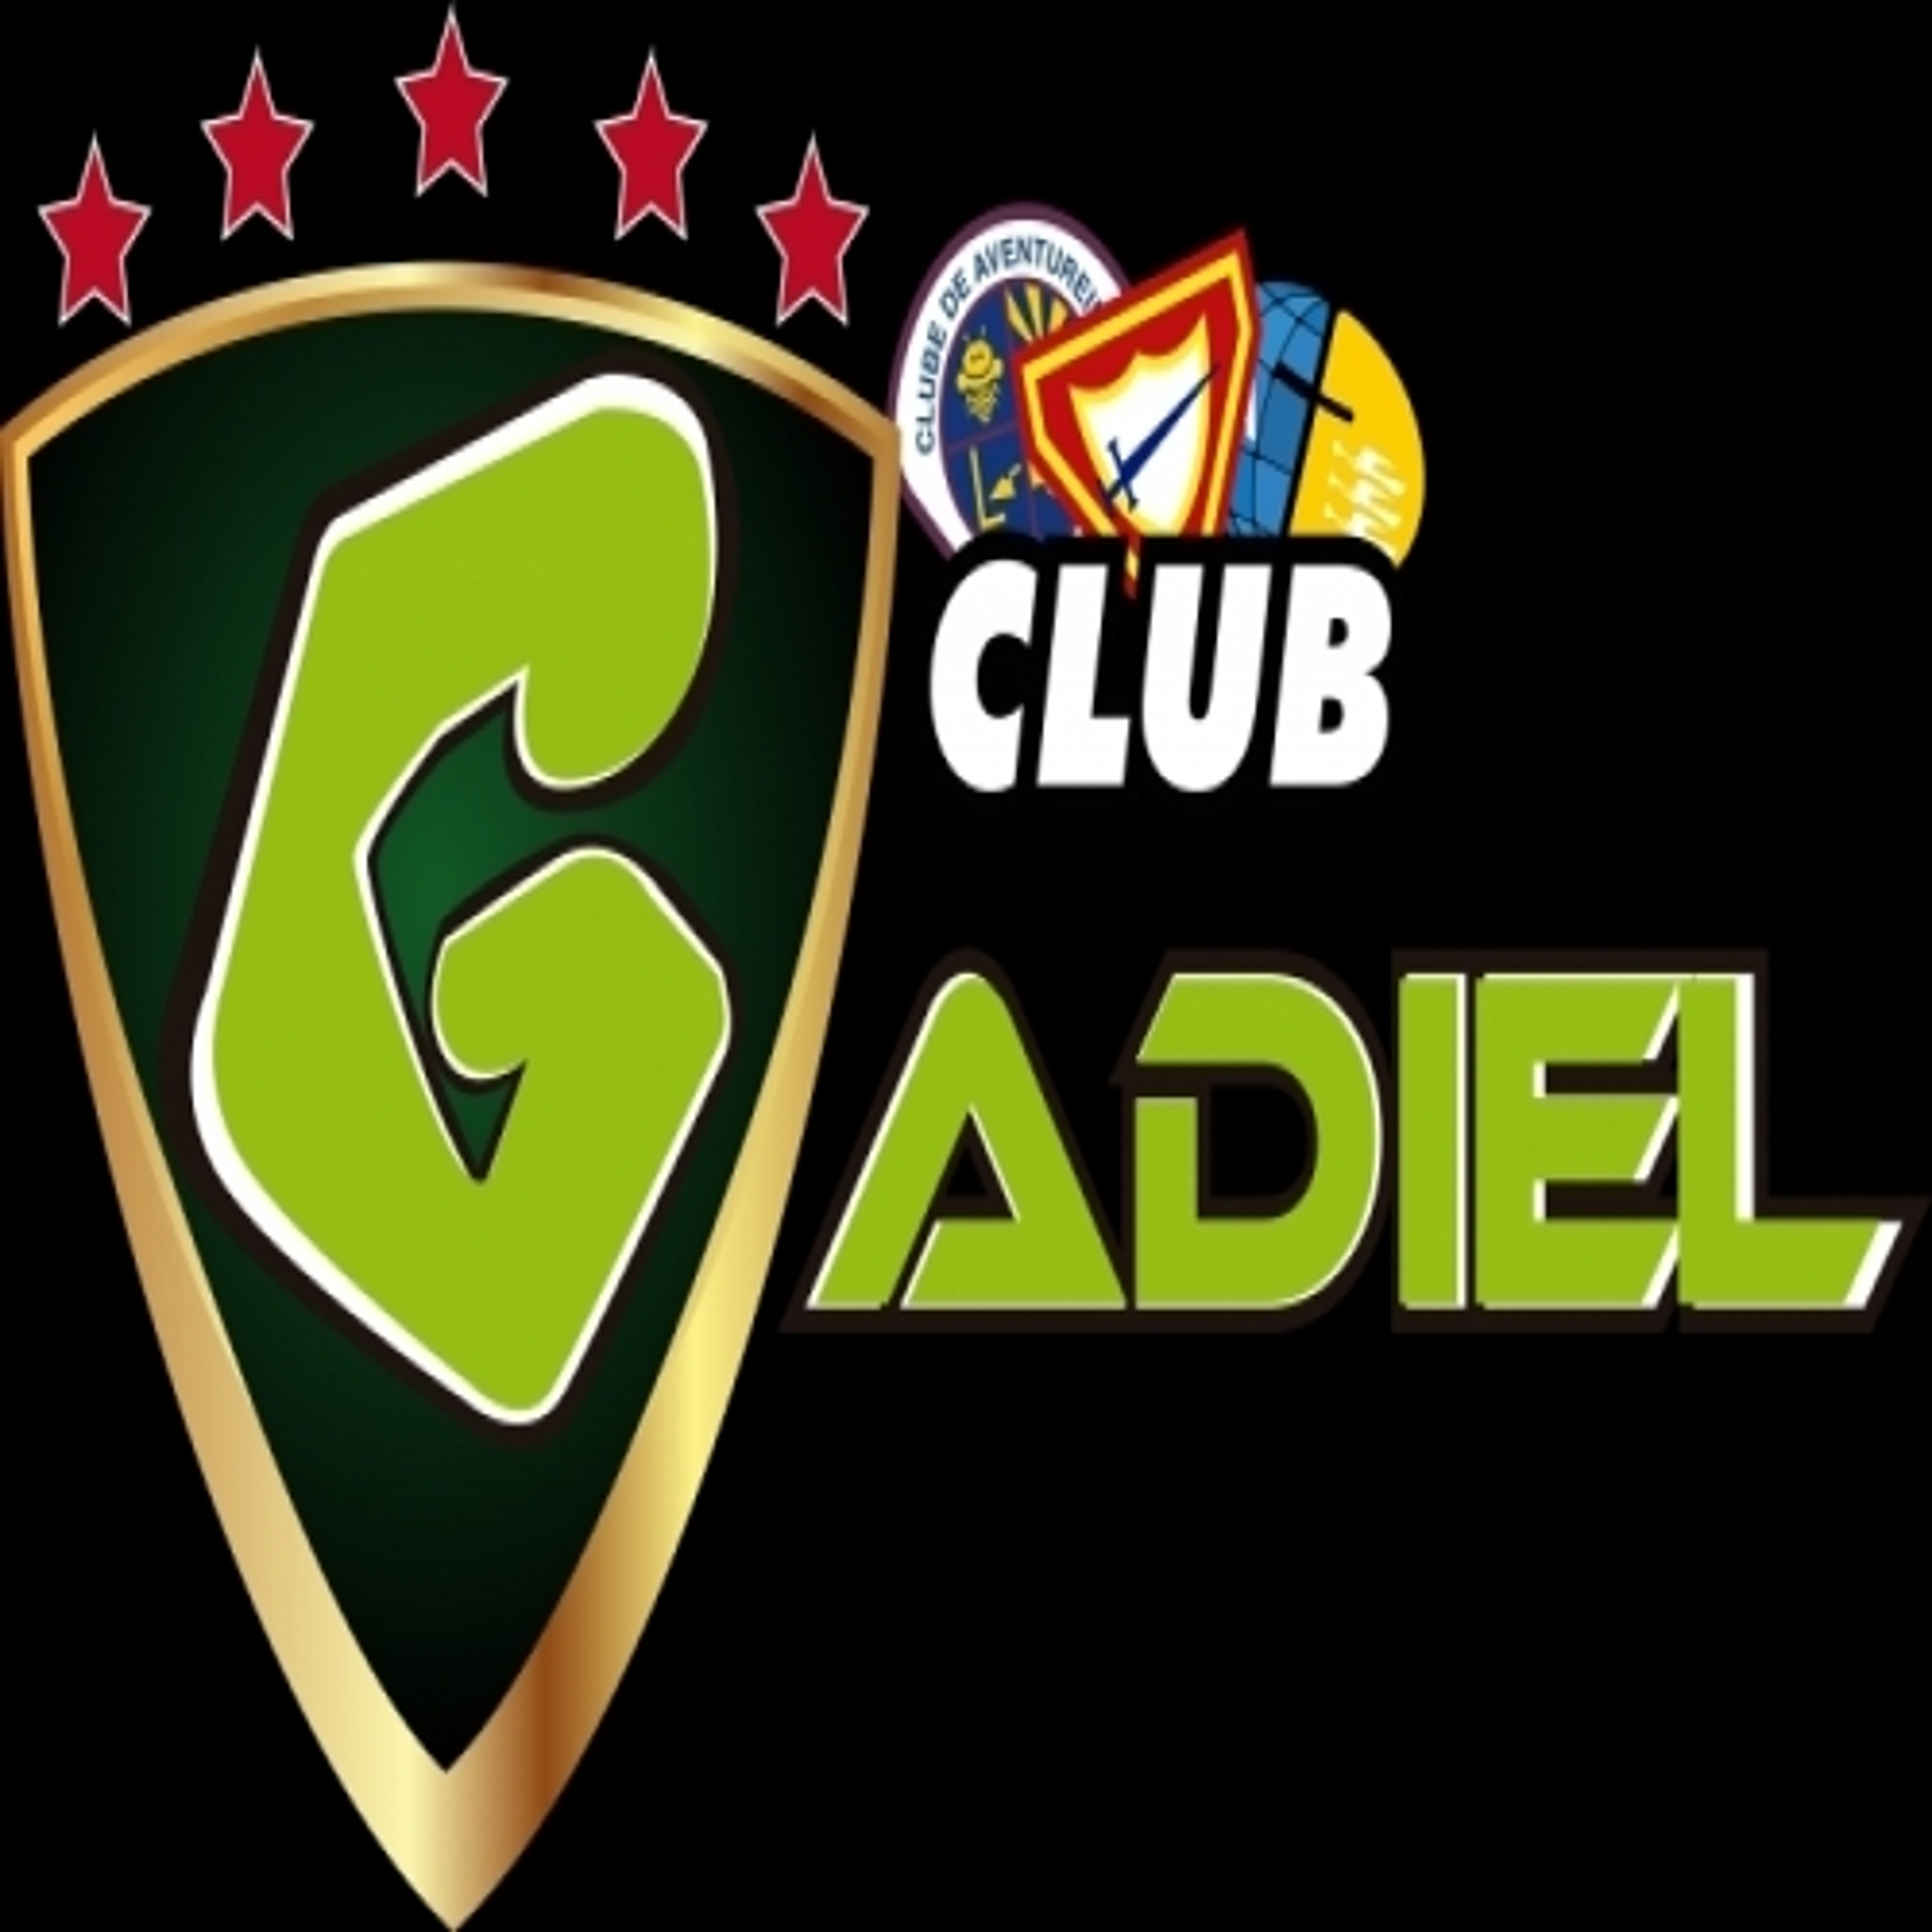 Gadiel (milagro)